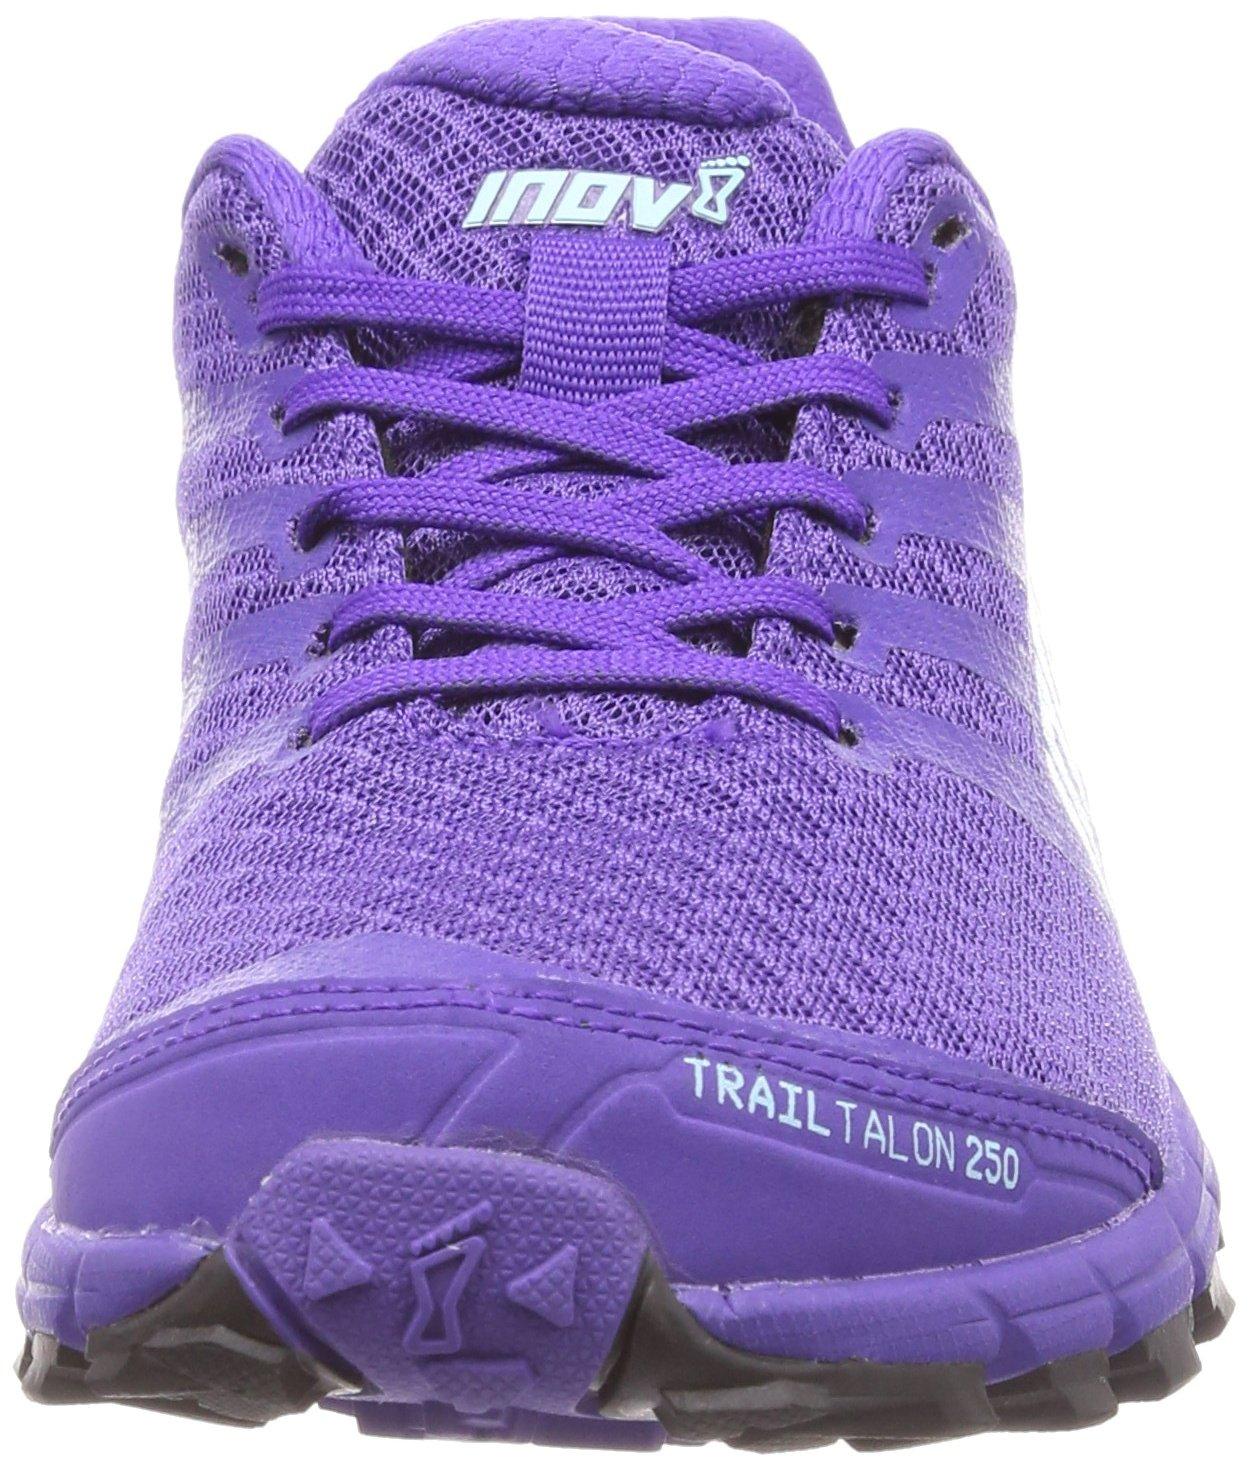 Inov-8 Womens Trailtalon 250 B073RCTN84 W7.5|Purple / Blue / Black